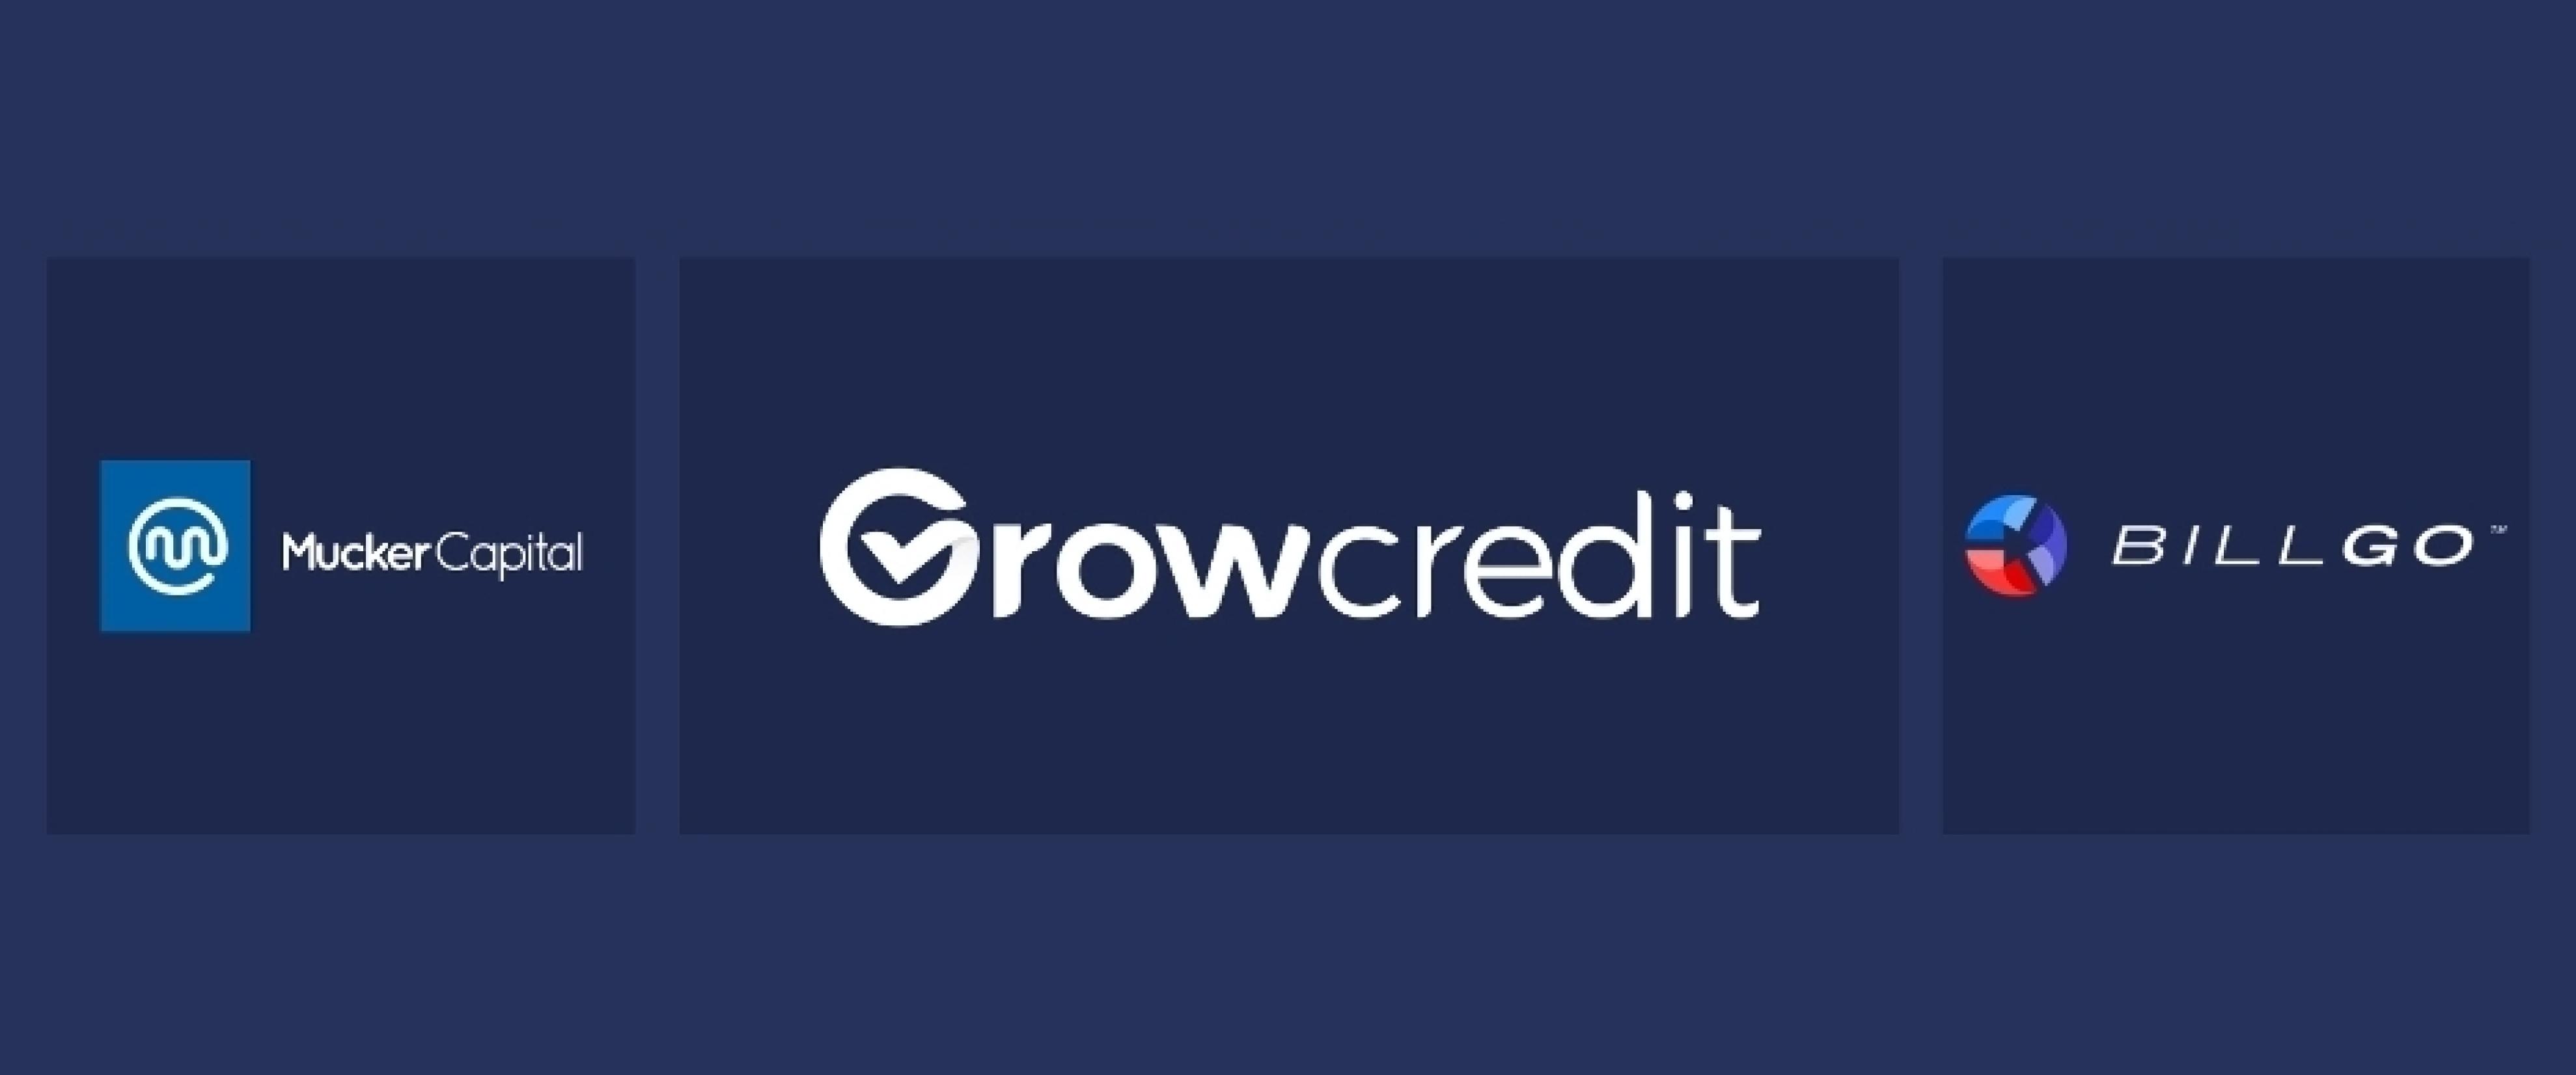 BillGO Invest in Grow Credit